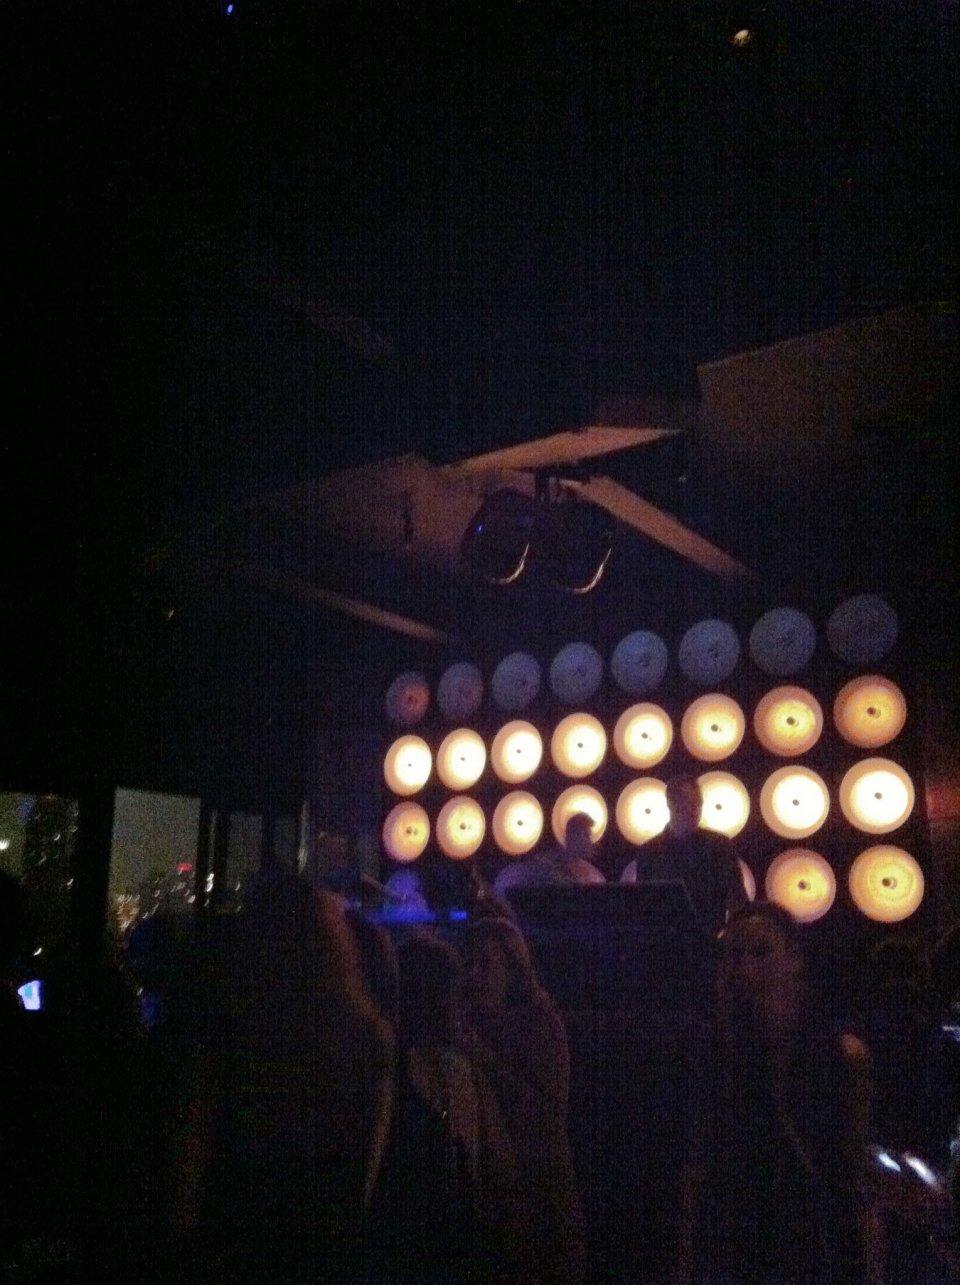 DJ booth at PH-D